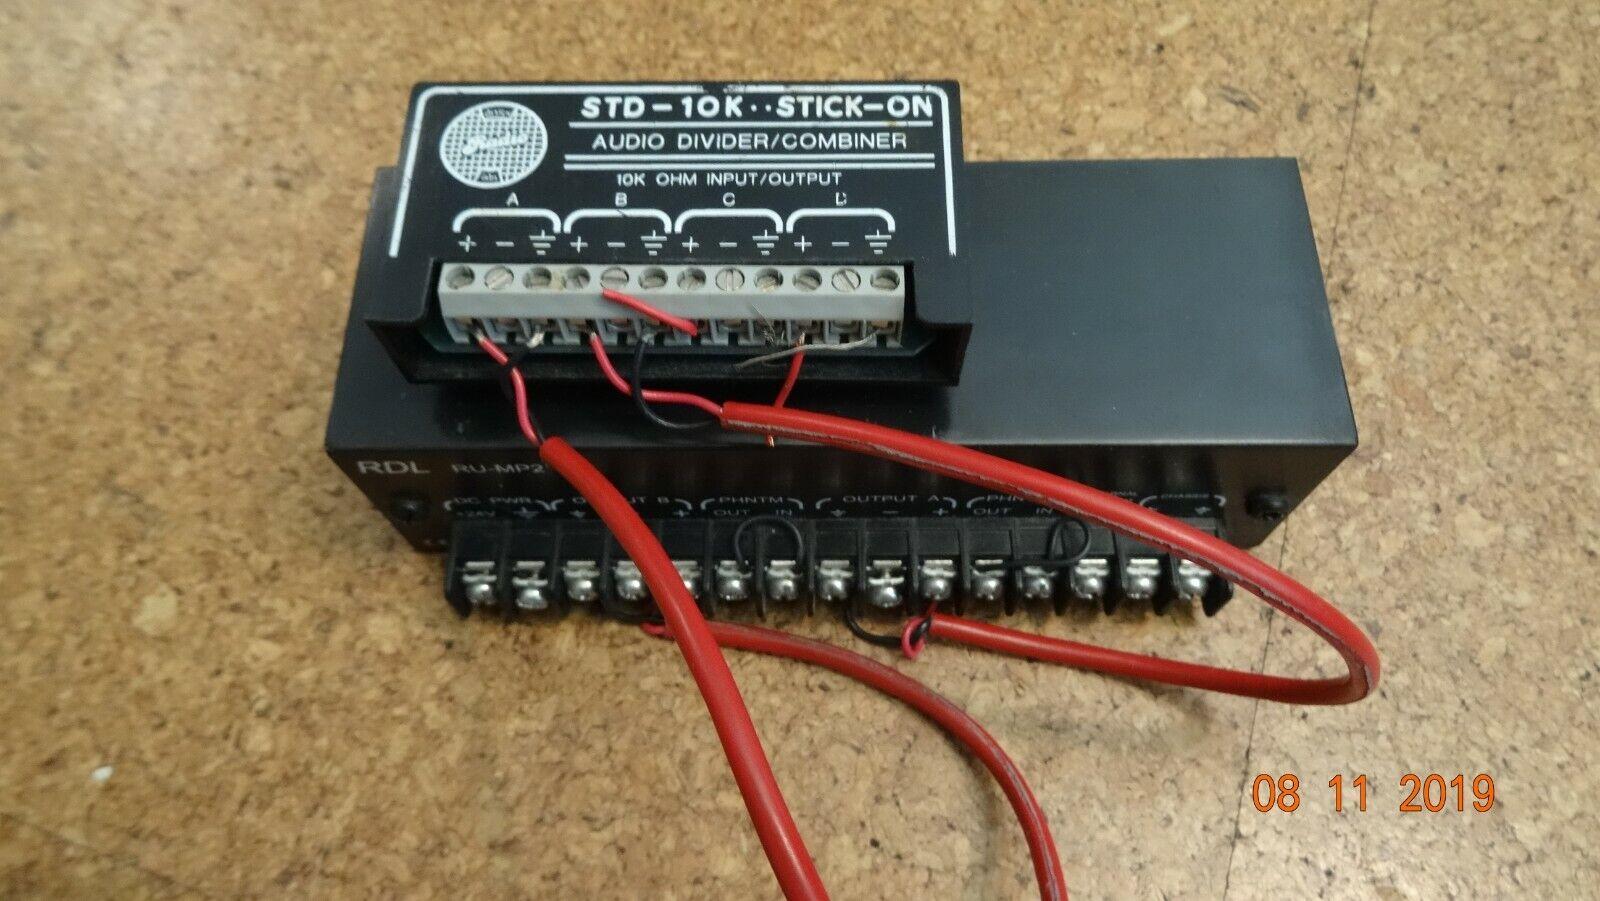 RDL RU-MP2 STEREO MIC PREAMPLIFIER   RDL STD-10K Divider-Combiner